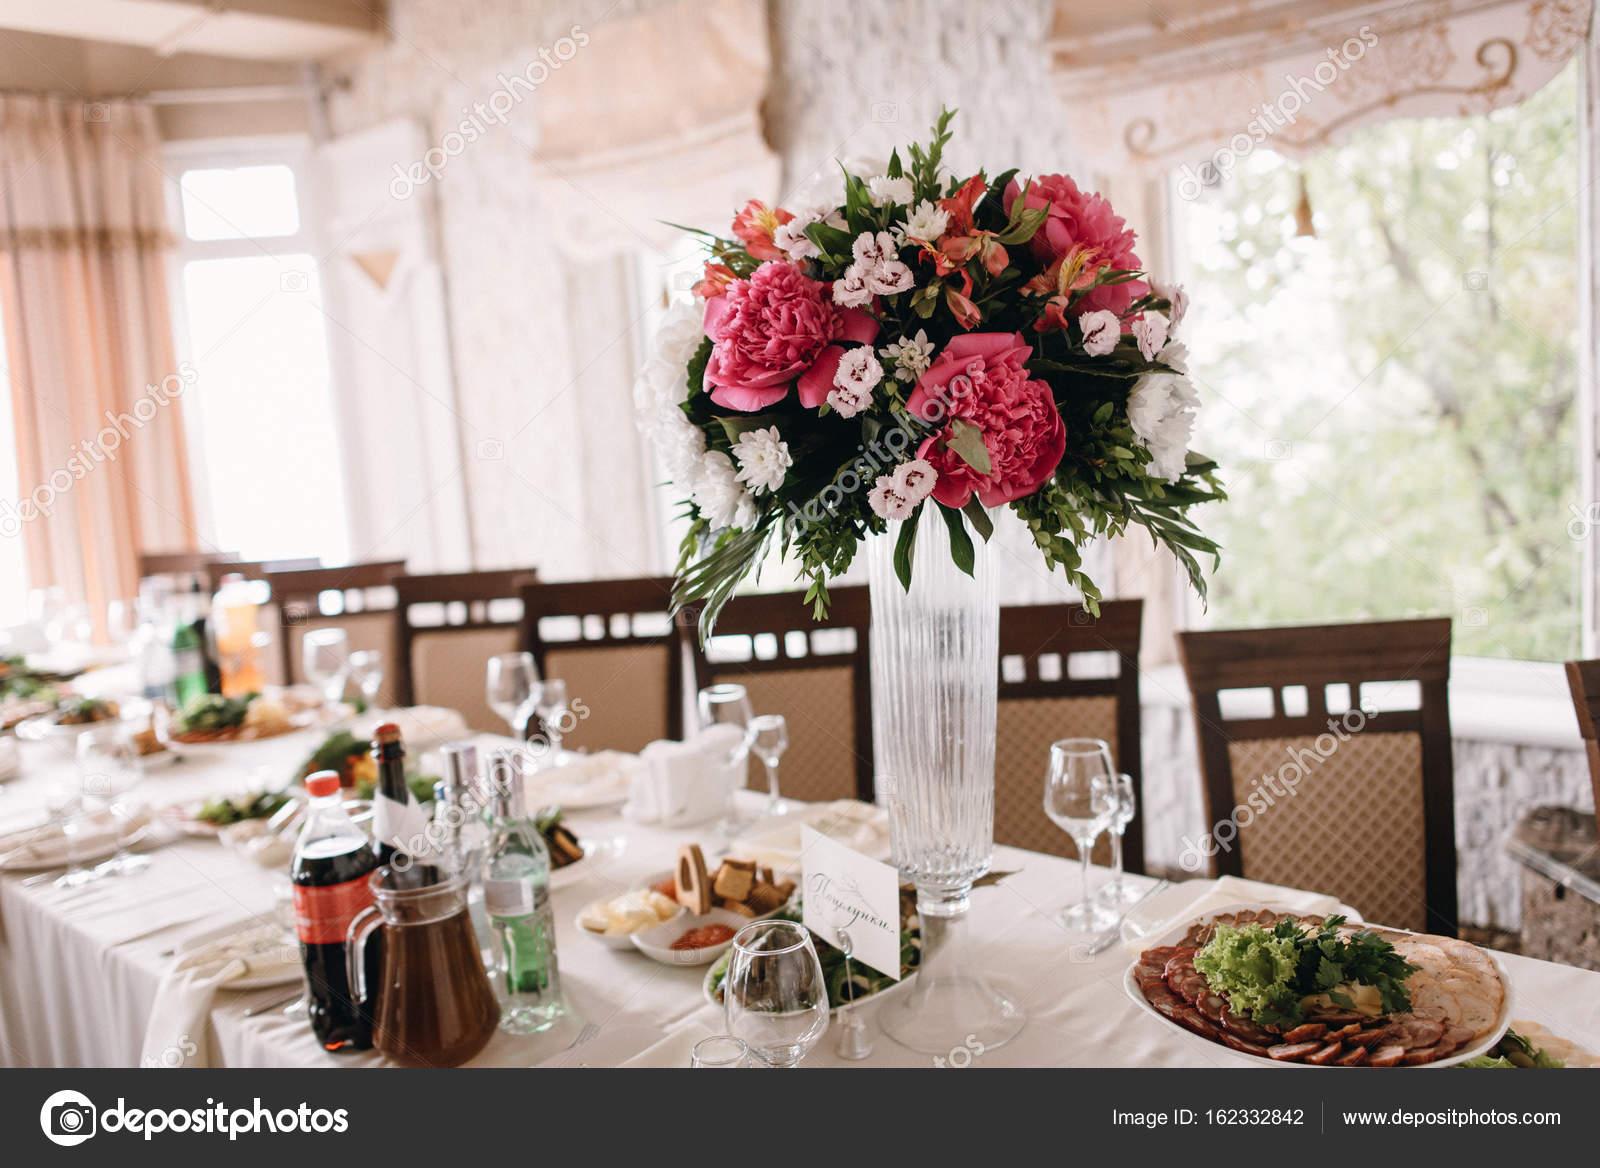 Hochzeit Dekoration Mit Pfingstrosen Stockfoto C Bondart 162332842